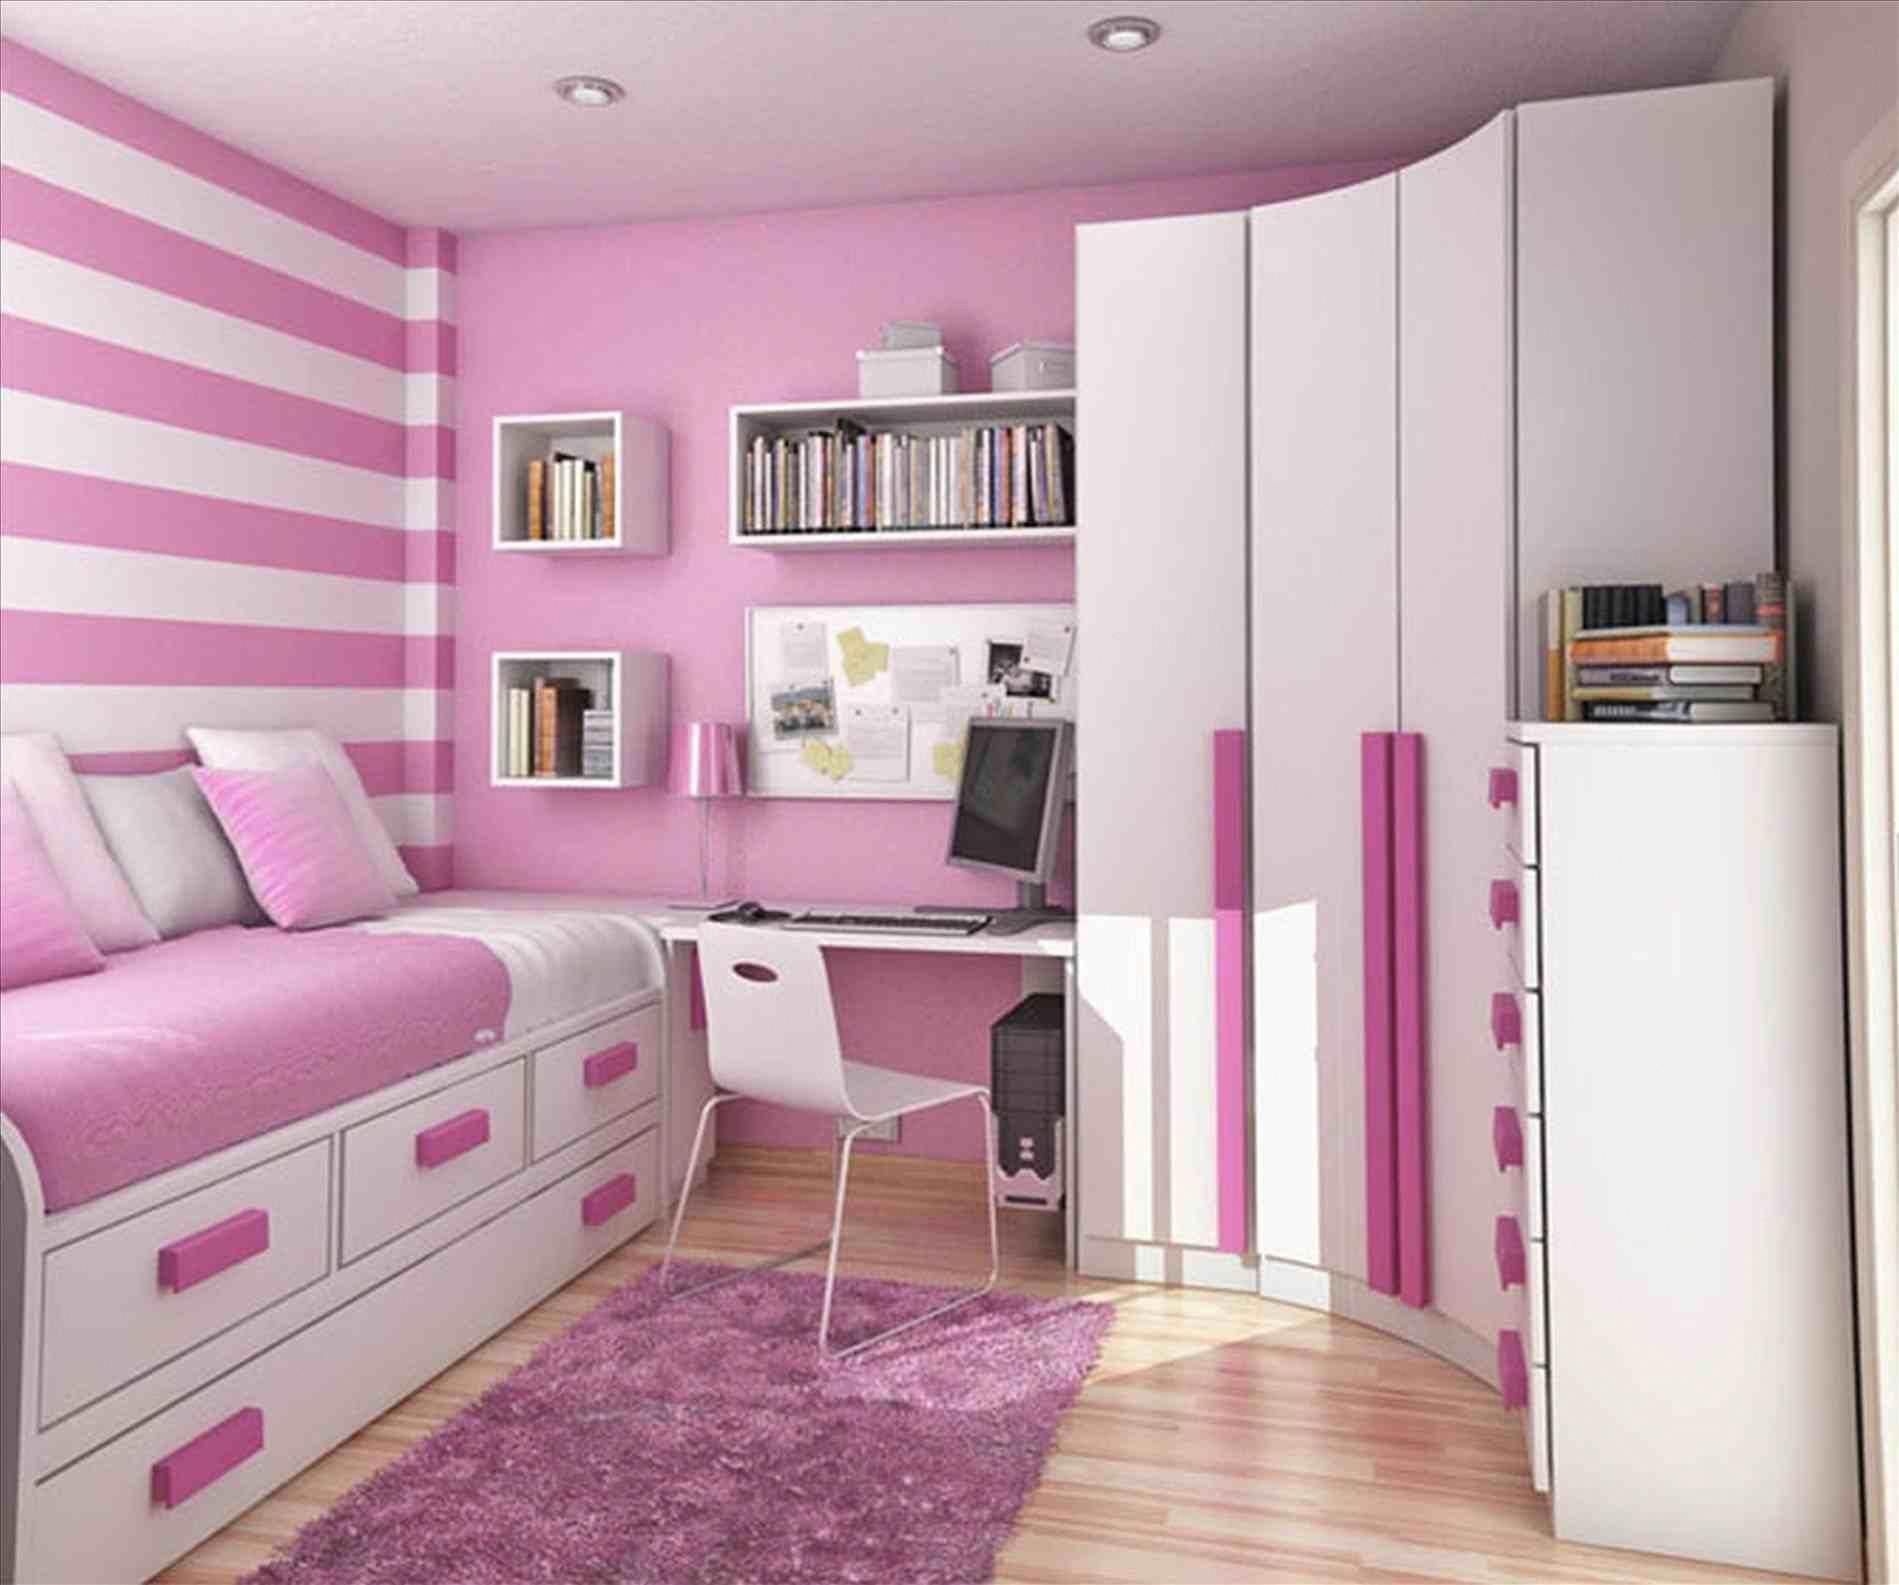 25 top view post interior design bedroom for teenage girls purple rh pinterest com